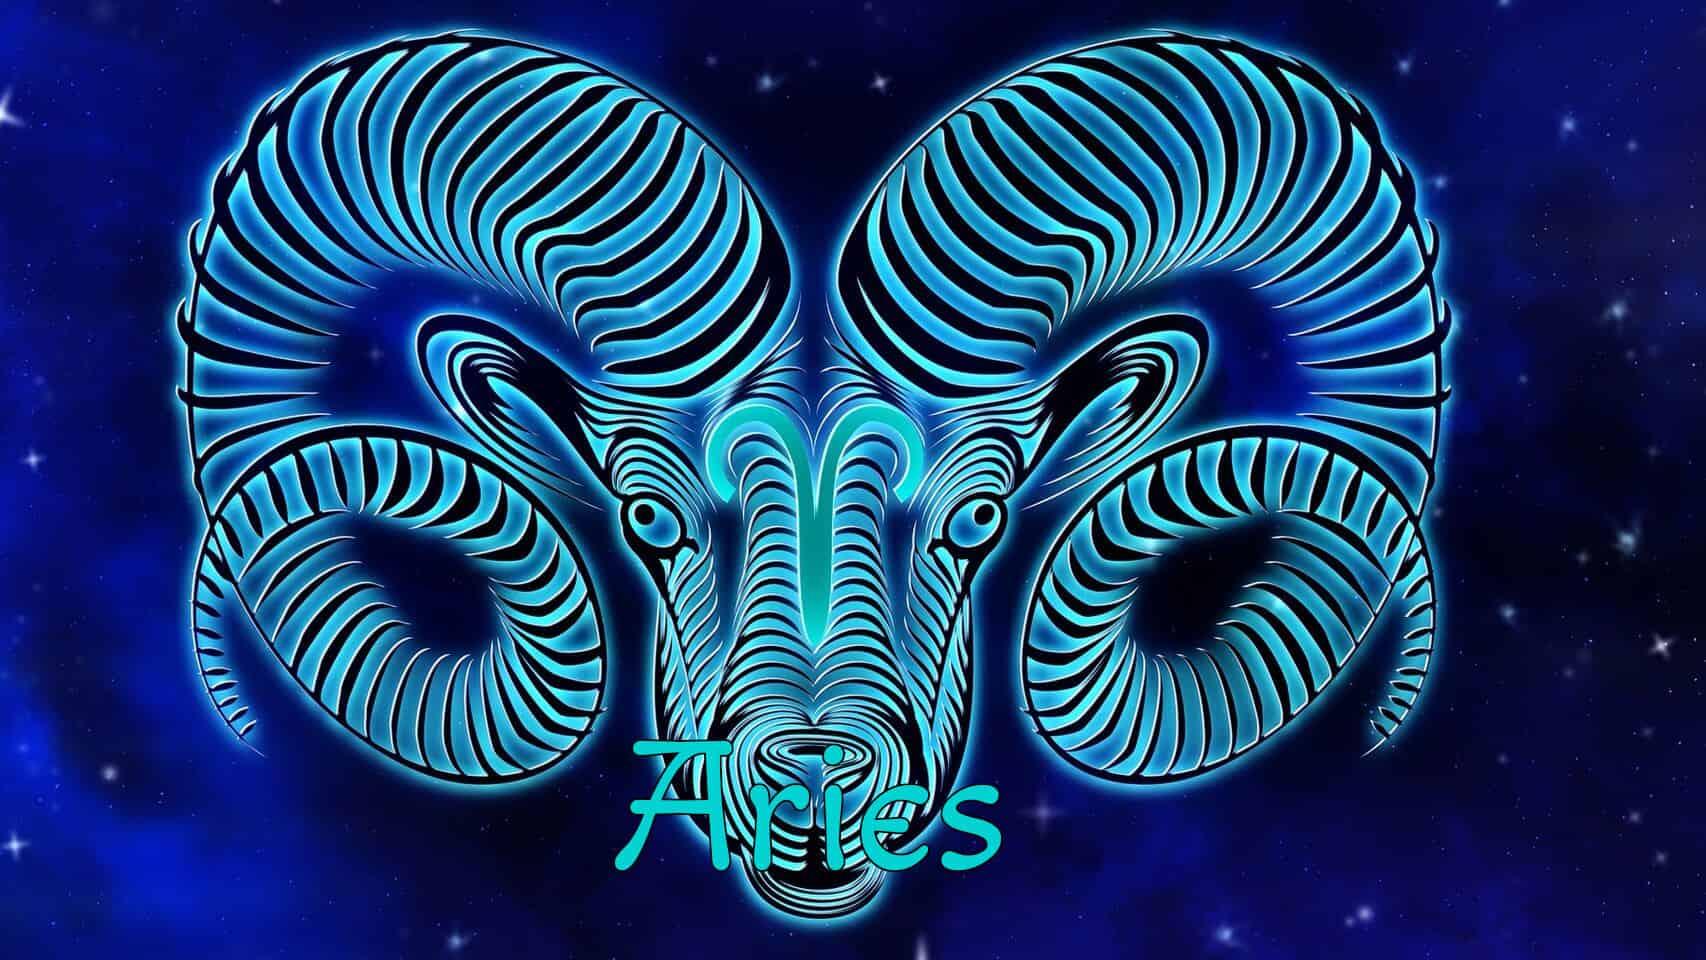 Horsocopo Aries